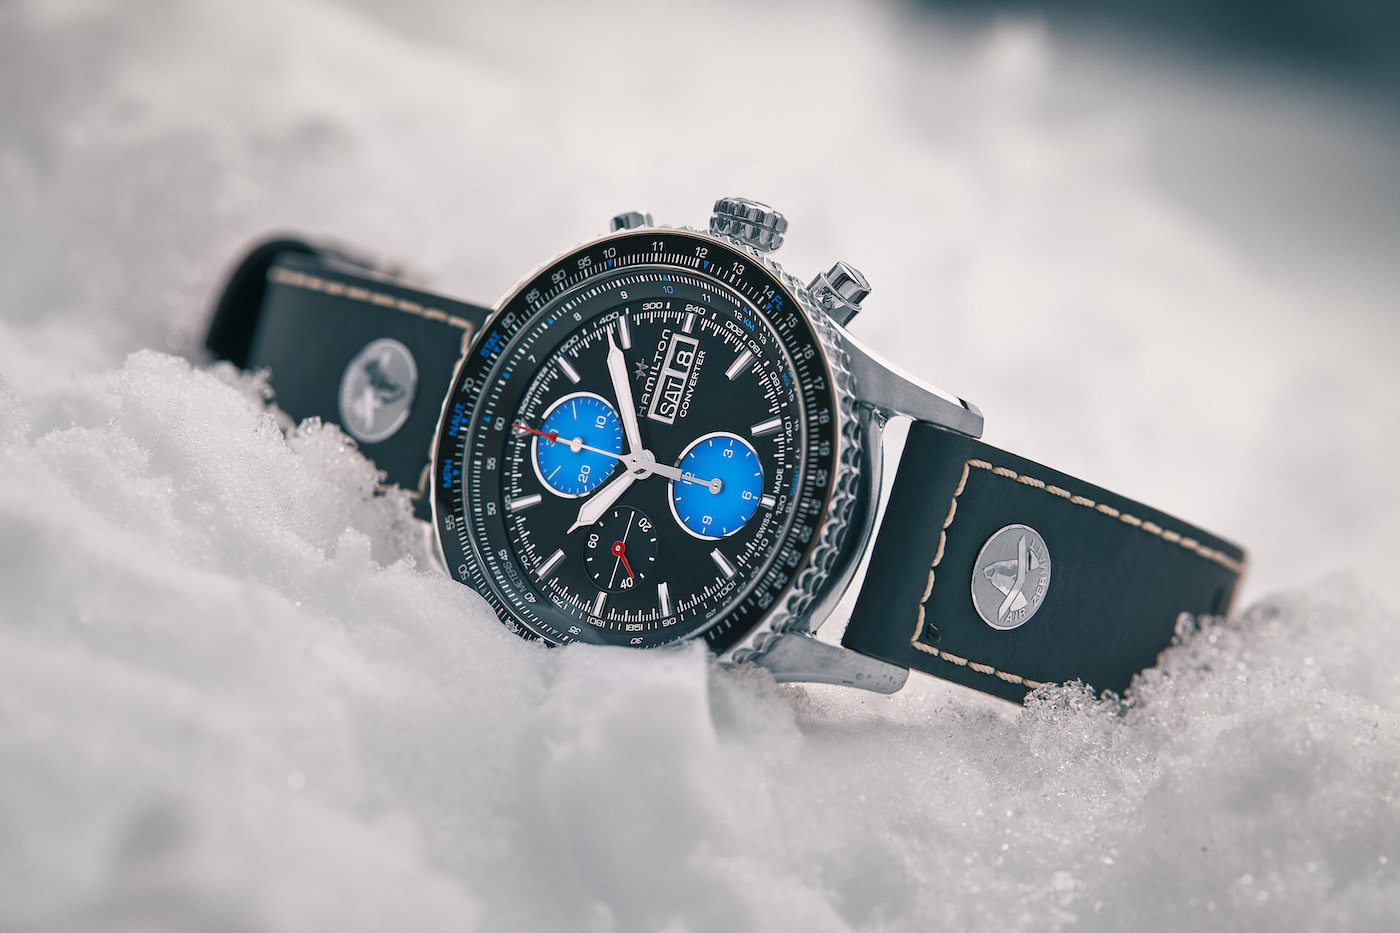 Presenting Hamilton's special timepiece for Air Zermatt